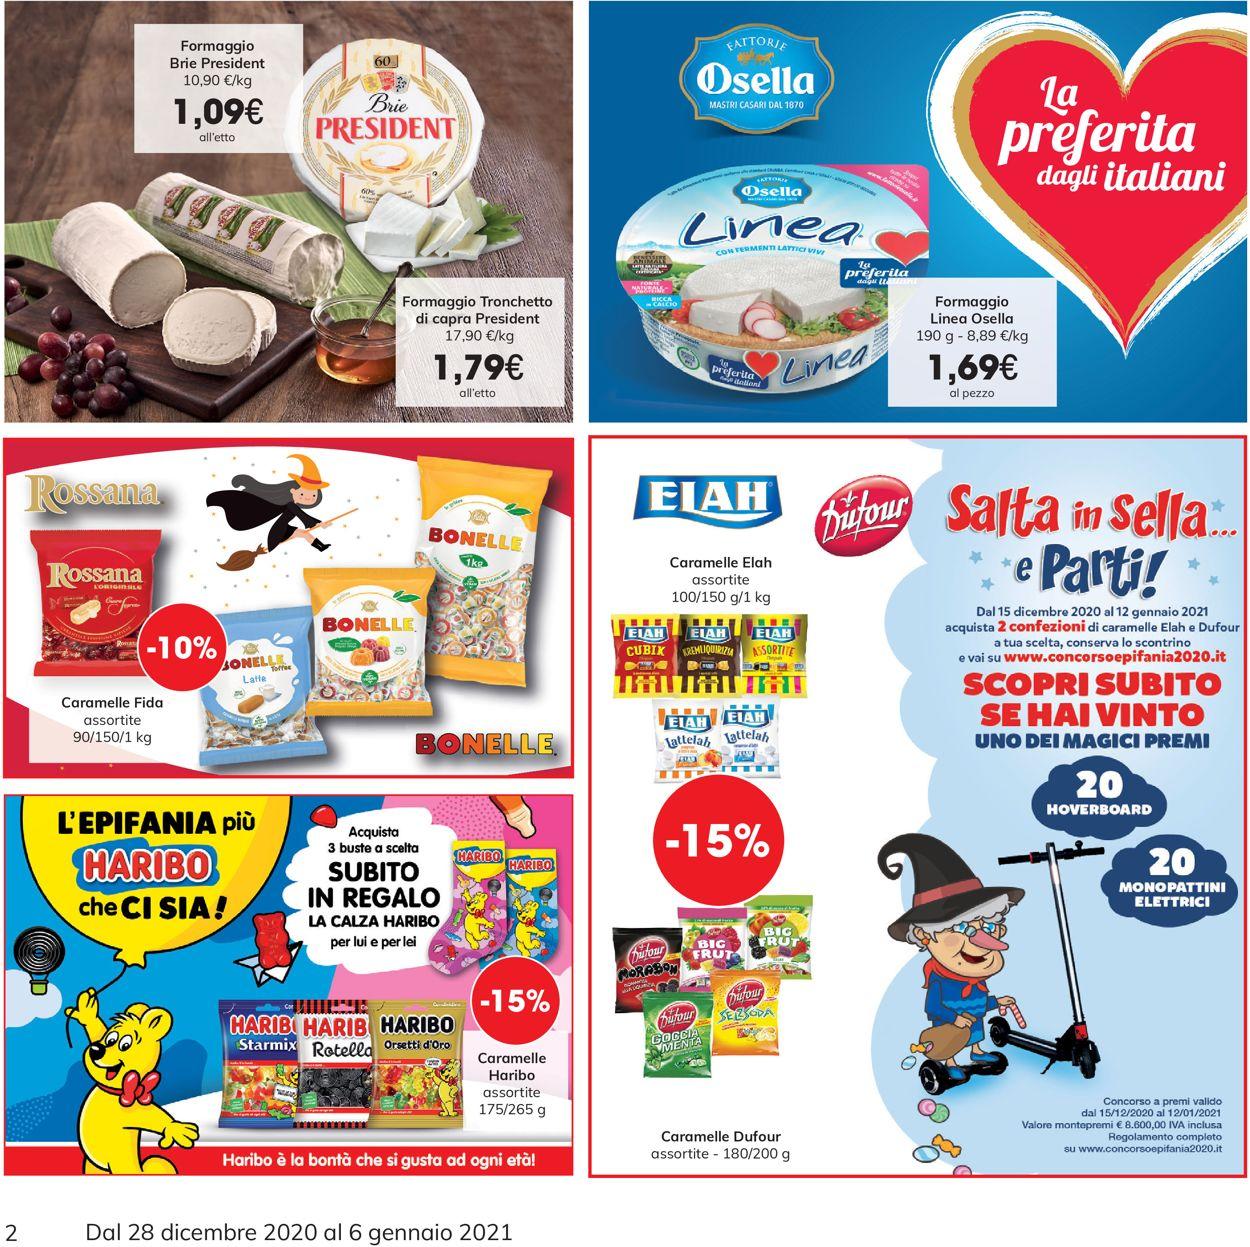 Volantino Eurospar -  Capodanno 2021 - Offerte 28/12-06/01/2021 (Pagina 2)